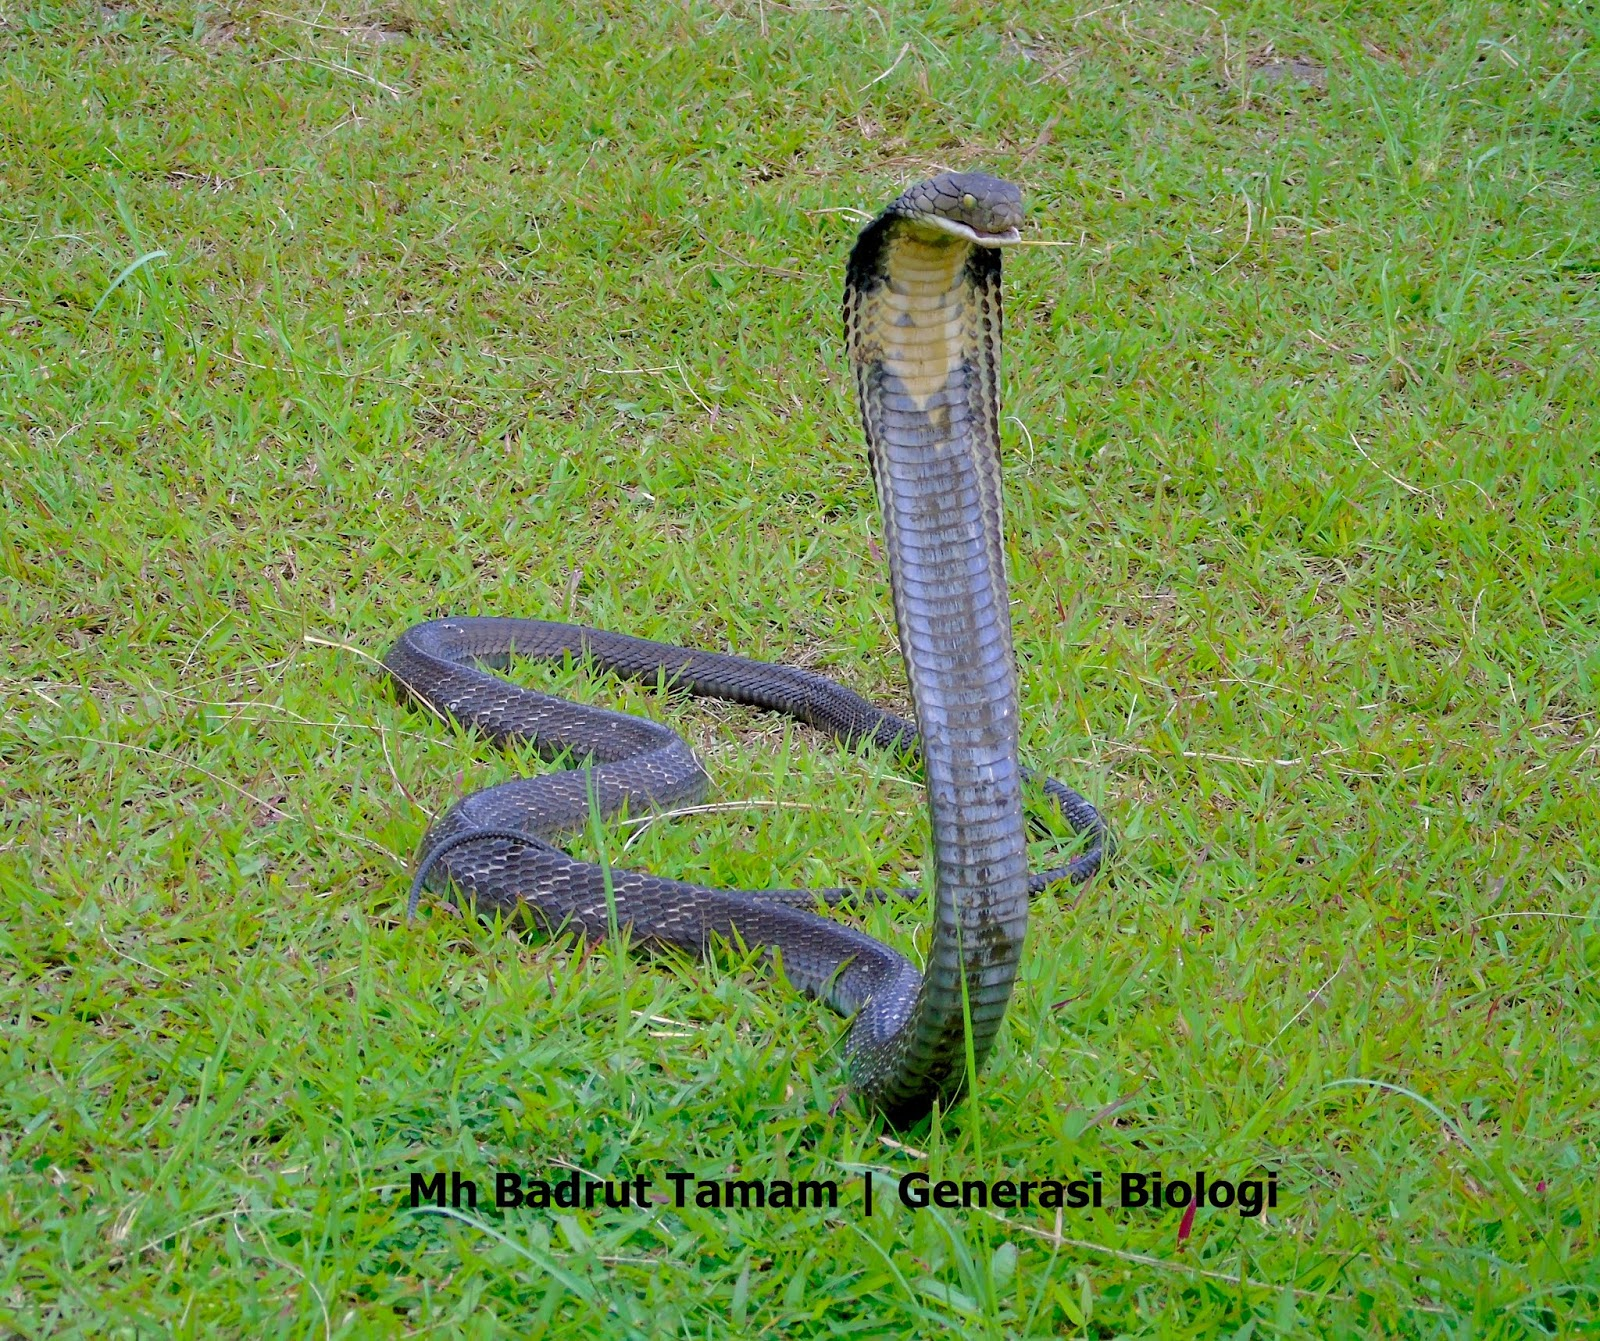 Biologi Ular Anang King Kobra